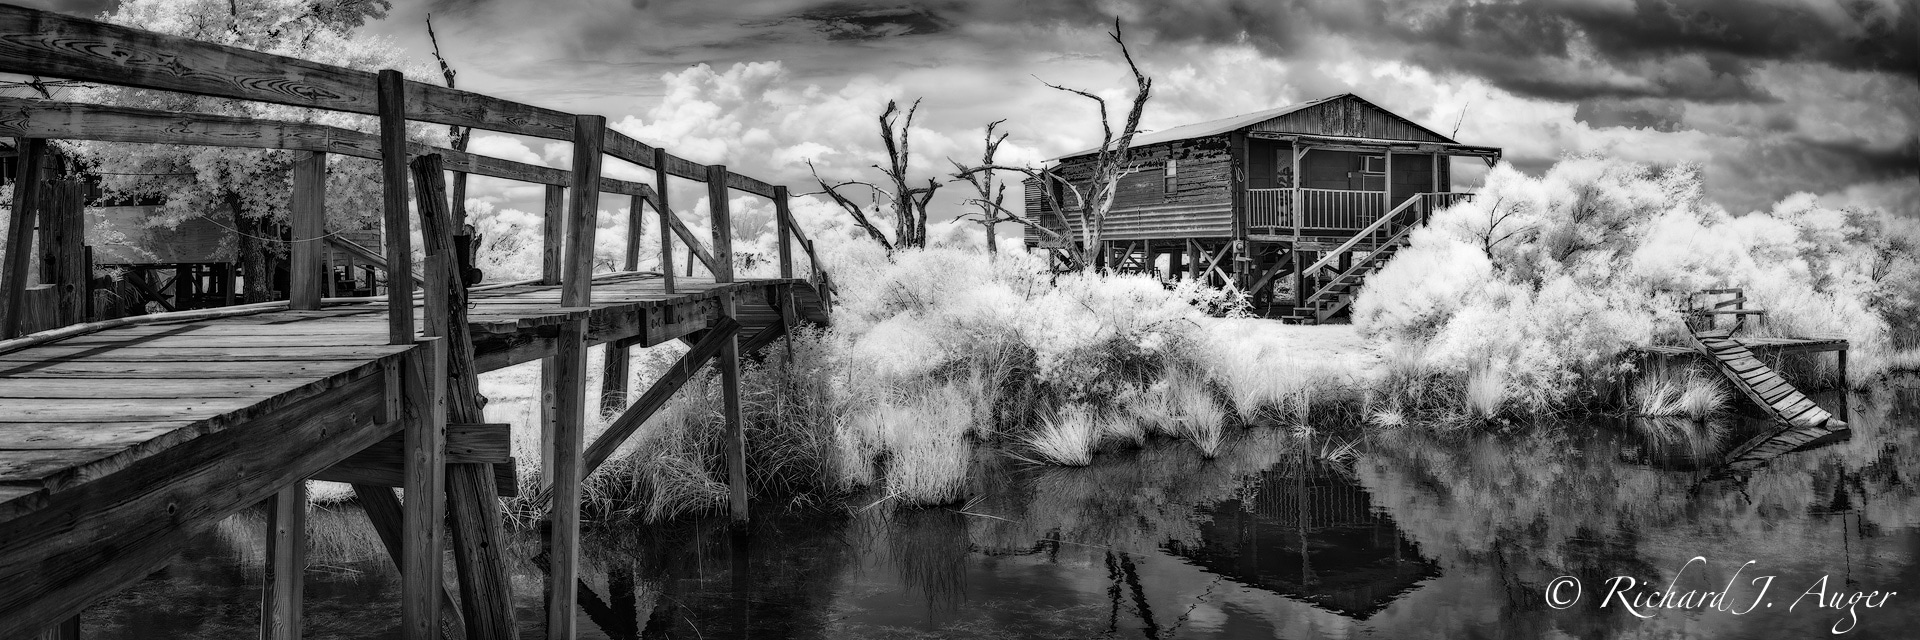 Isle de Dean Charles, Louisiana, Bayou, Fish Camp, Shack, Bridge, Disappearing, reflections, coast, stormy, panorama, photograph, black and white